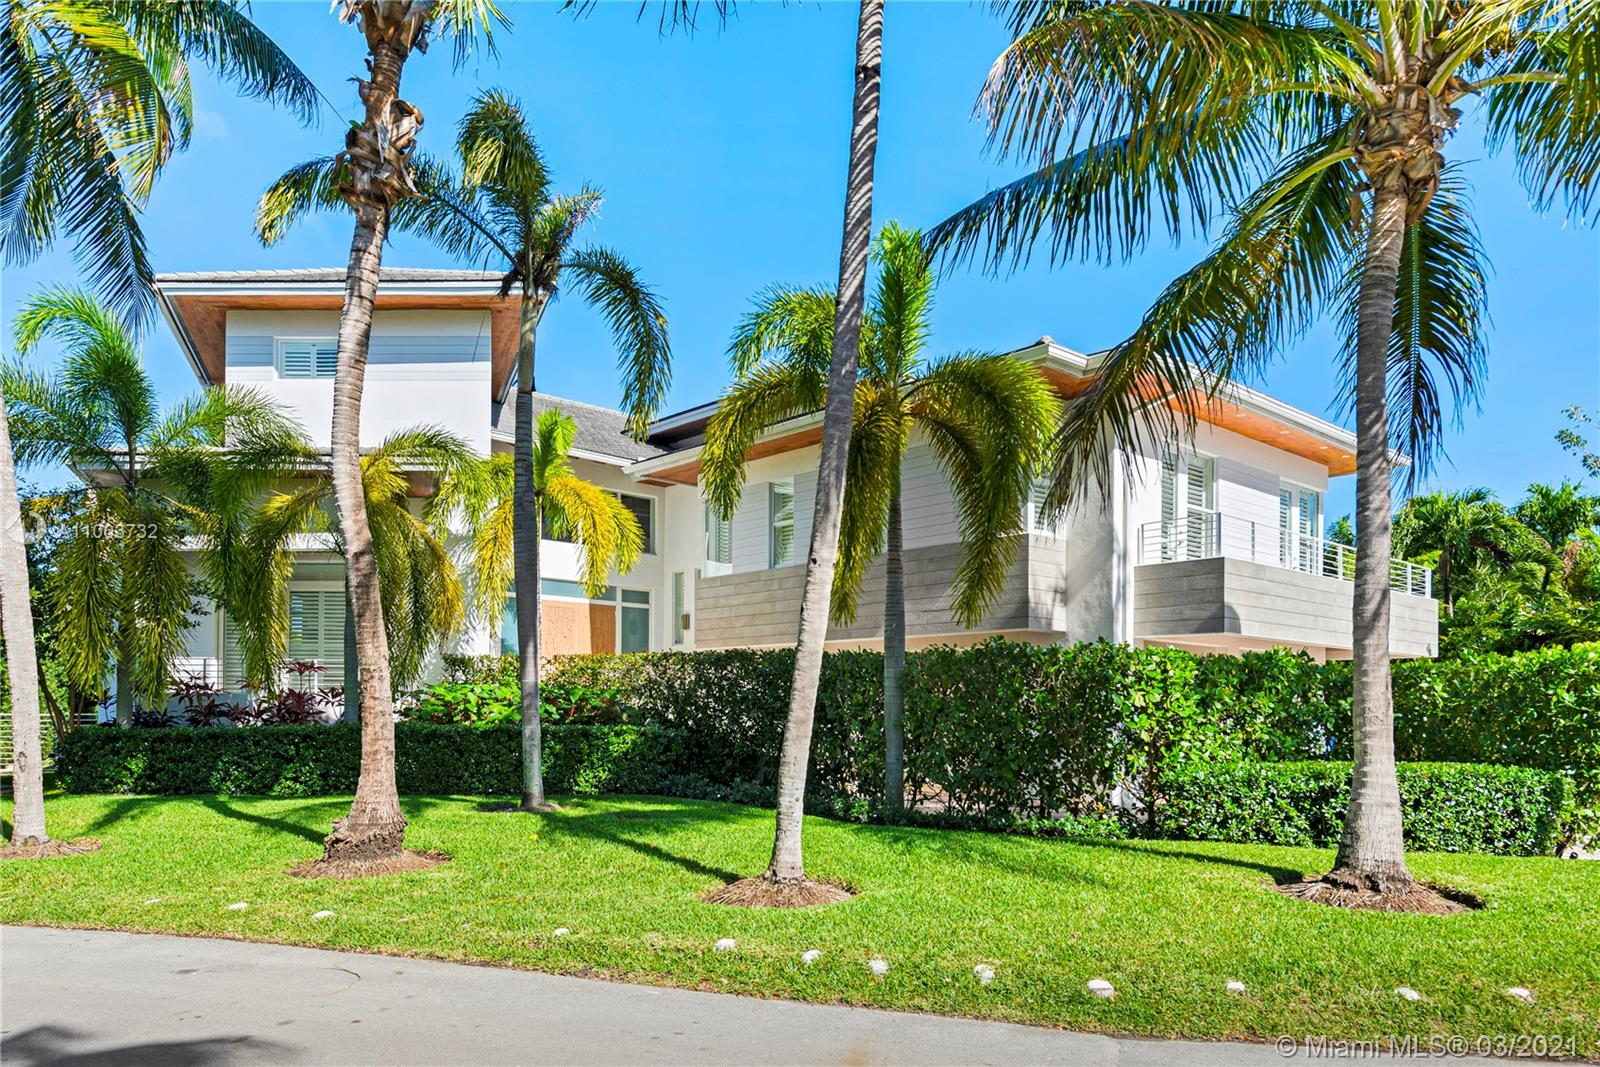 Tropical Isle Homes - 283 HARBOR COURT, Key Biscayne, FL 33149